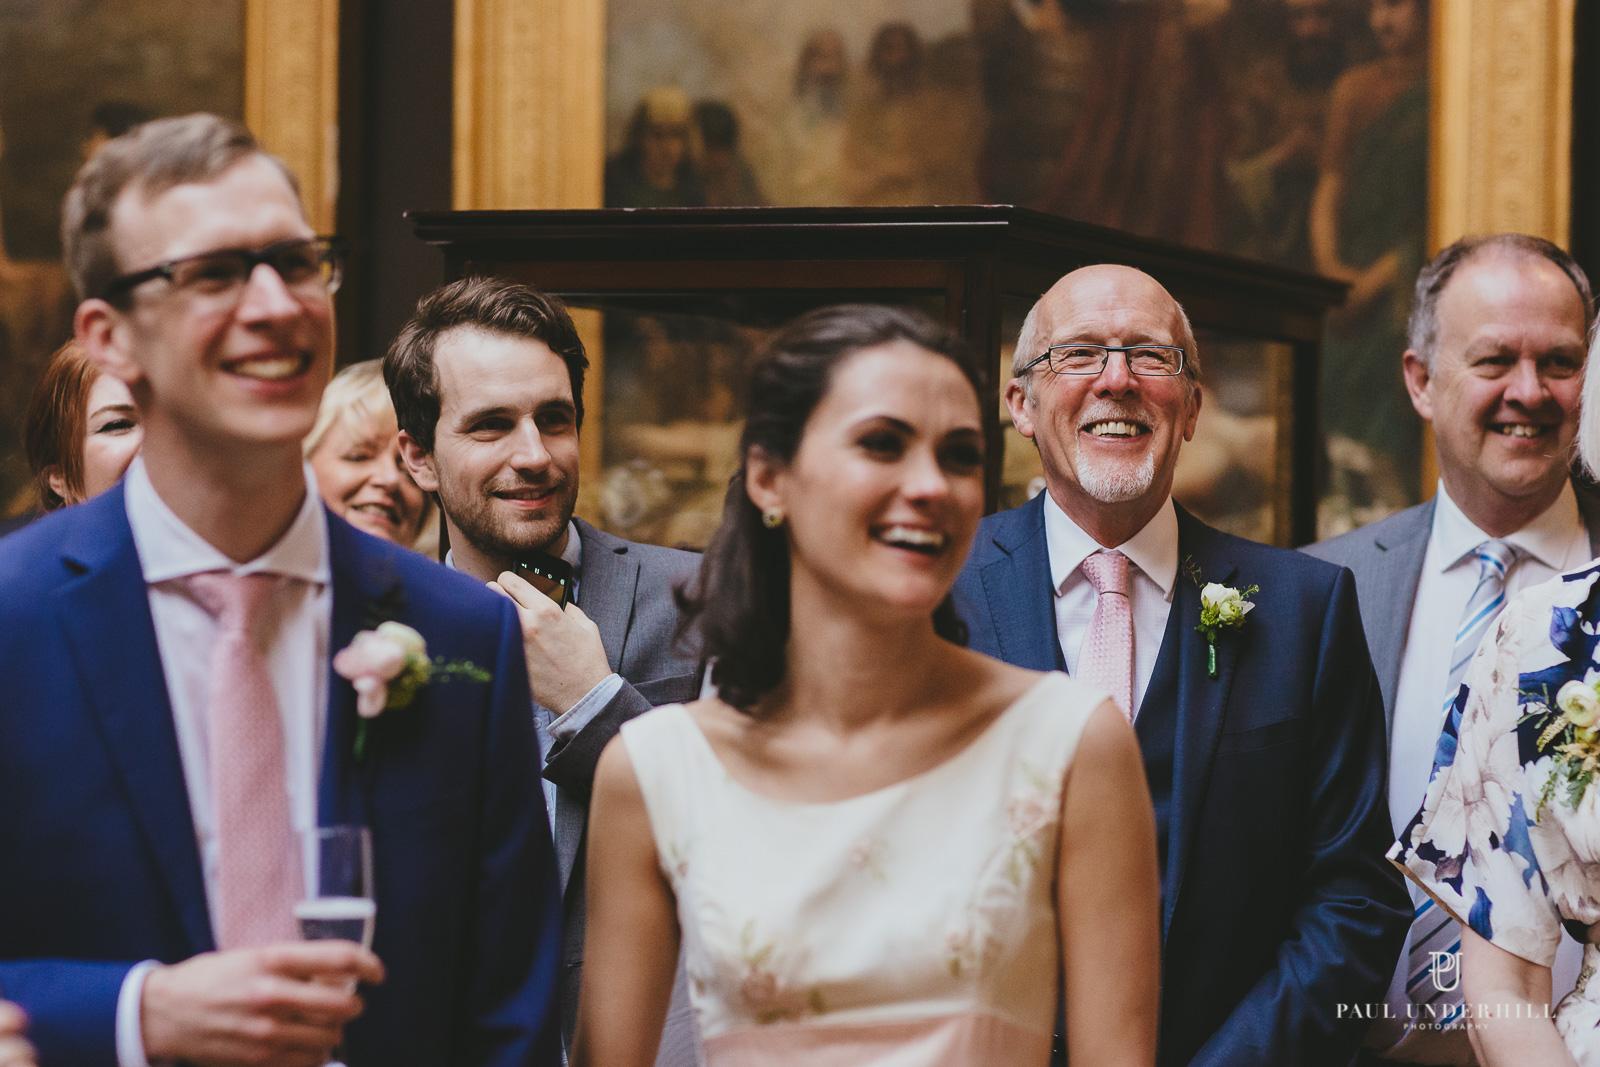 Fun moments wedding documentary photography